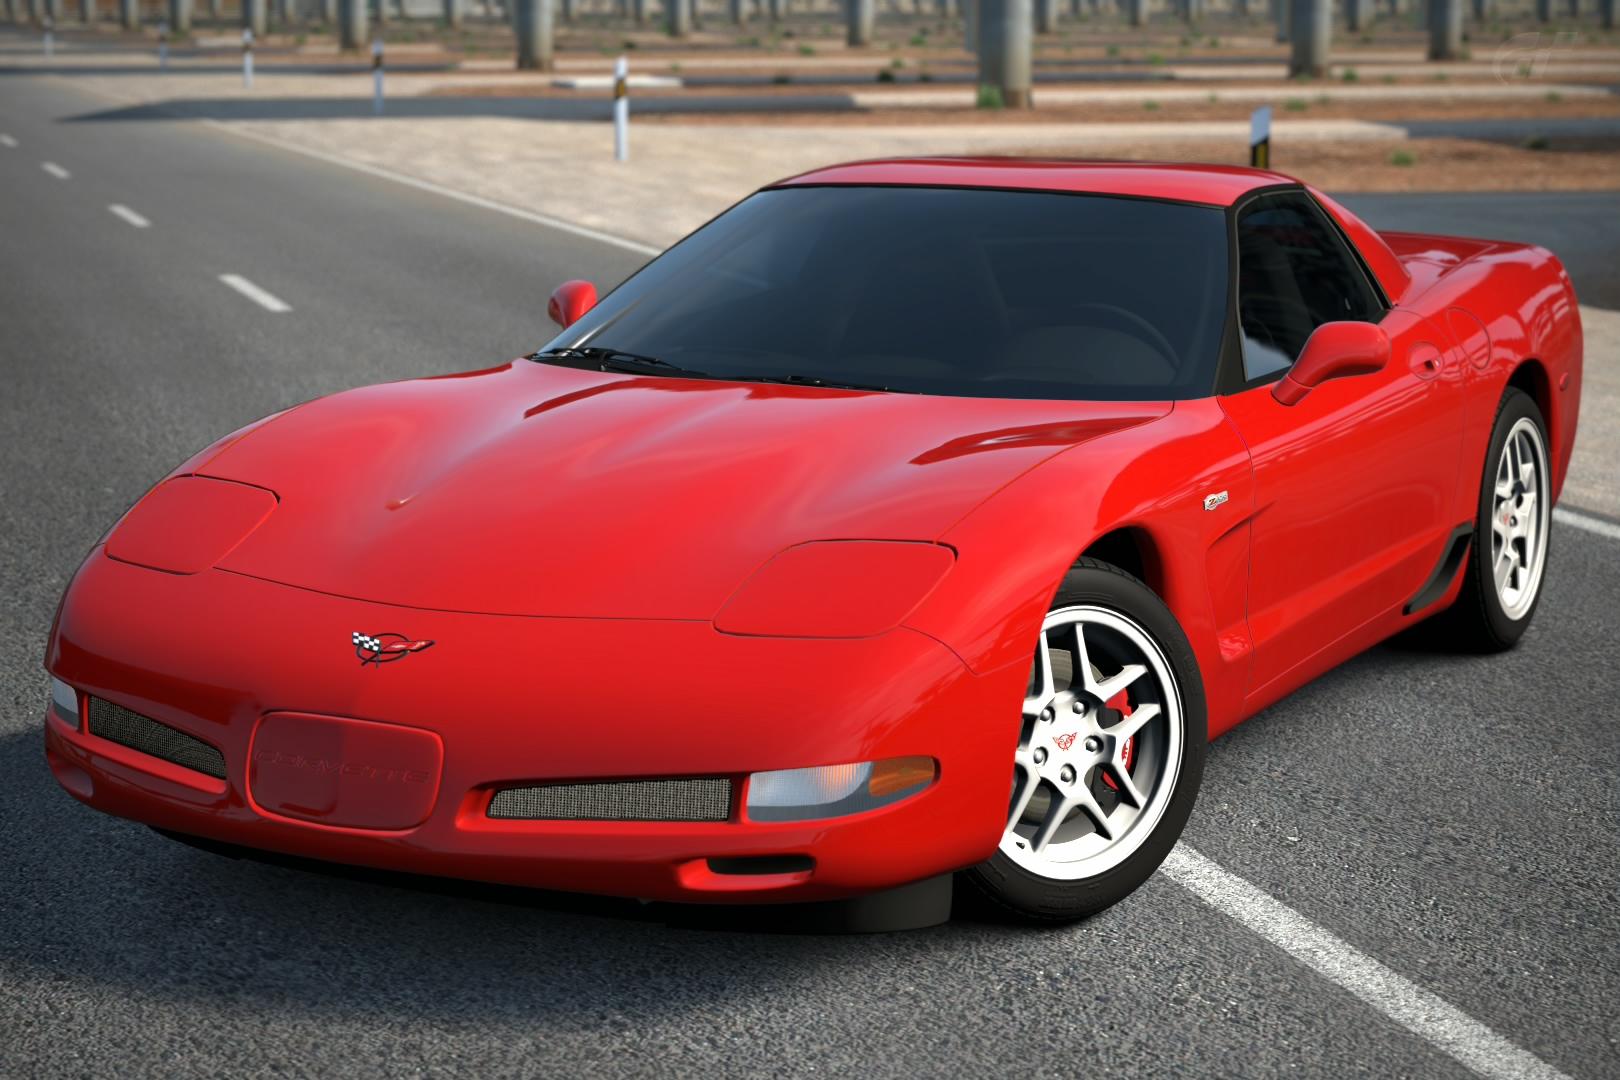 Kekurangan Corvette C5 Z06 Harga